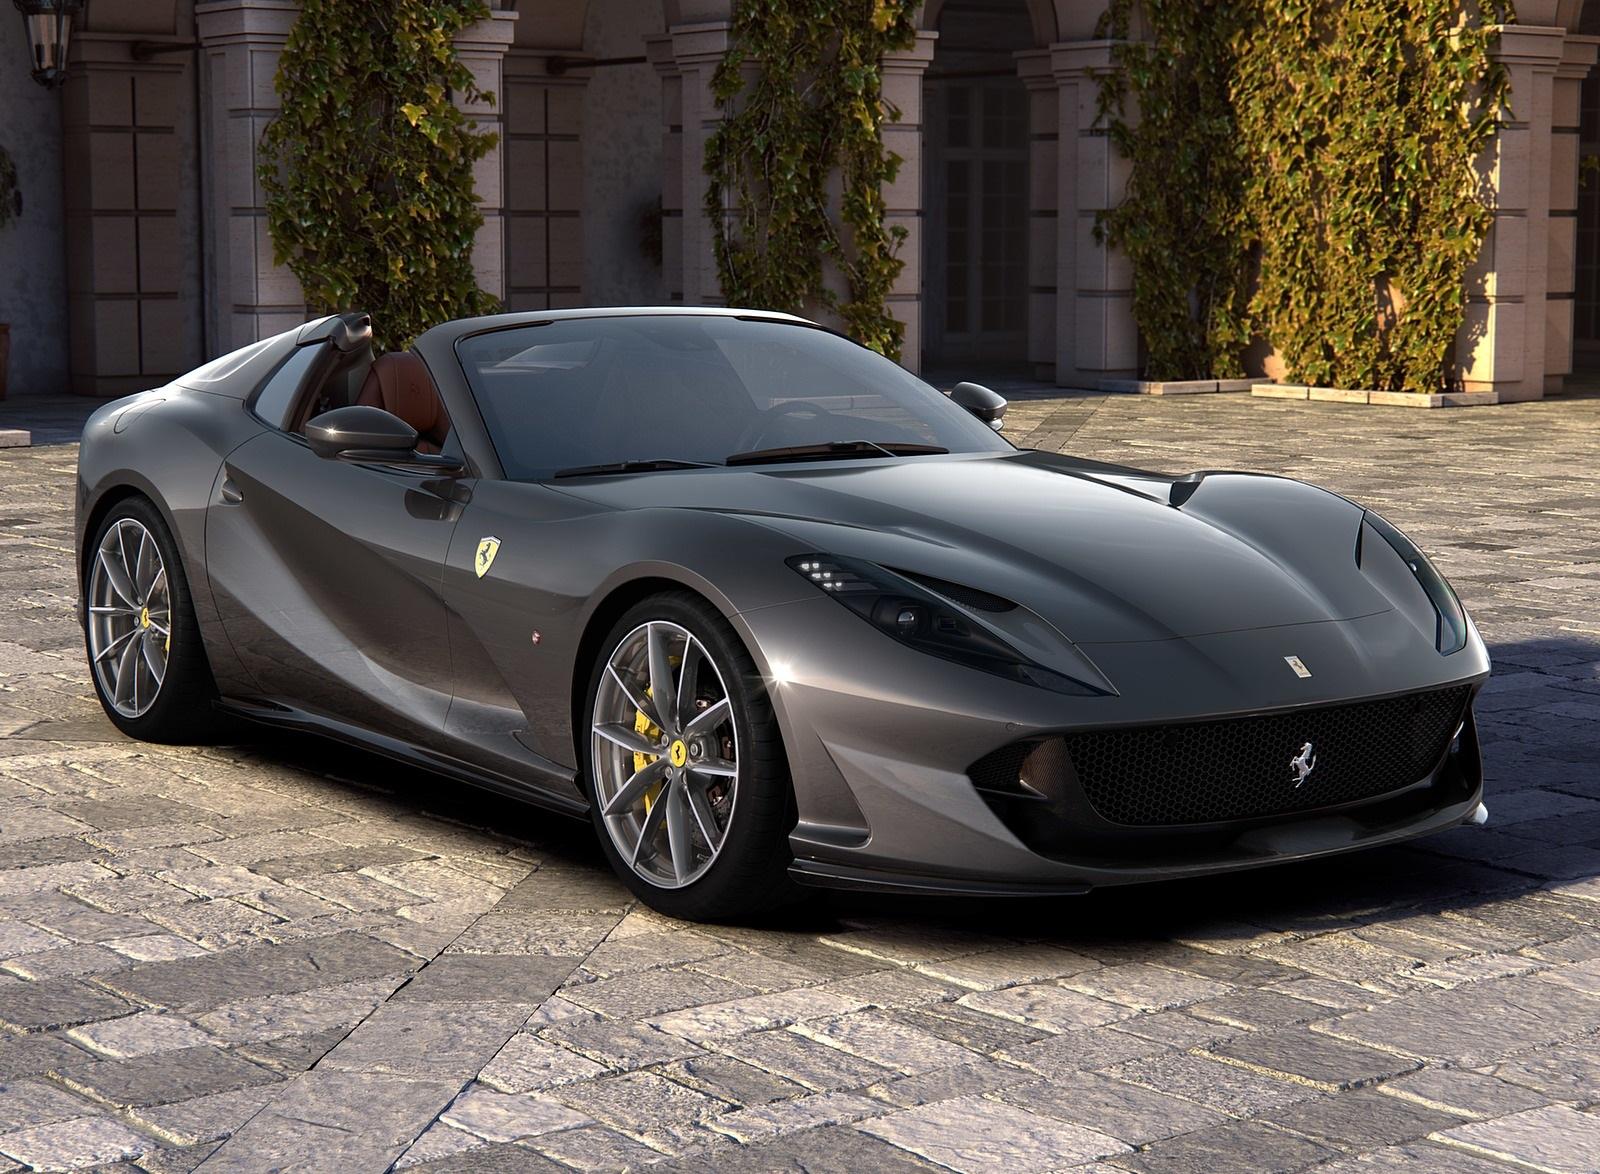 2020 Ferrari 812 Gts Wallpapers 14 Hd Images Newcarcars